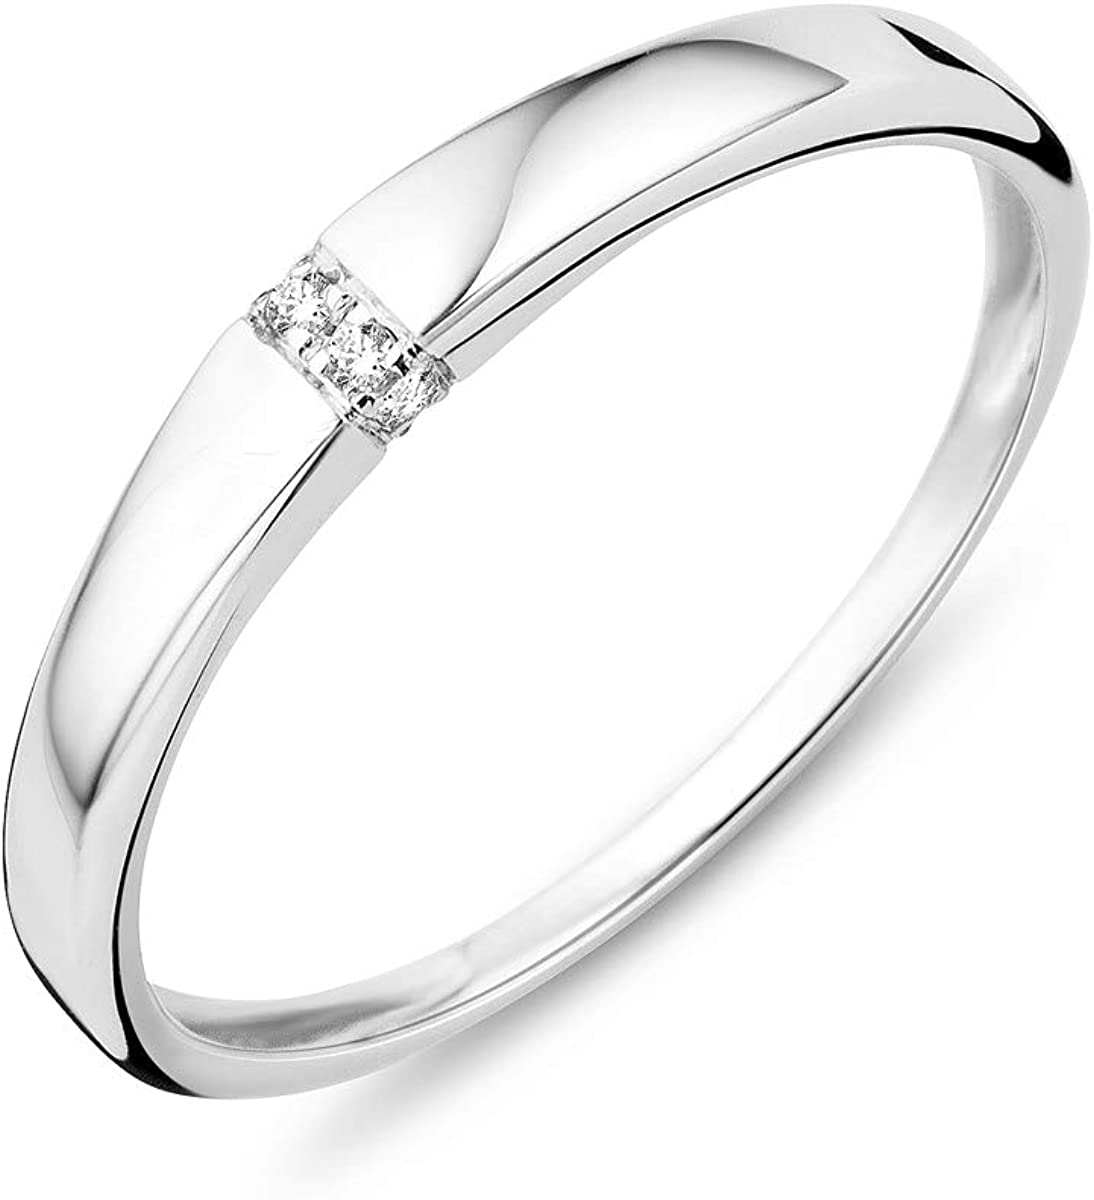 Miore - Anillo para mujer de oro blanco de 9 quilates (375) con diamante de 0,02 ct